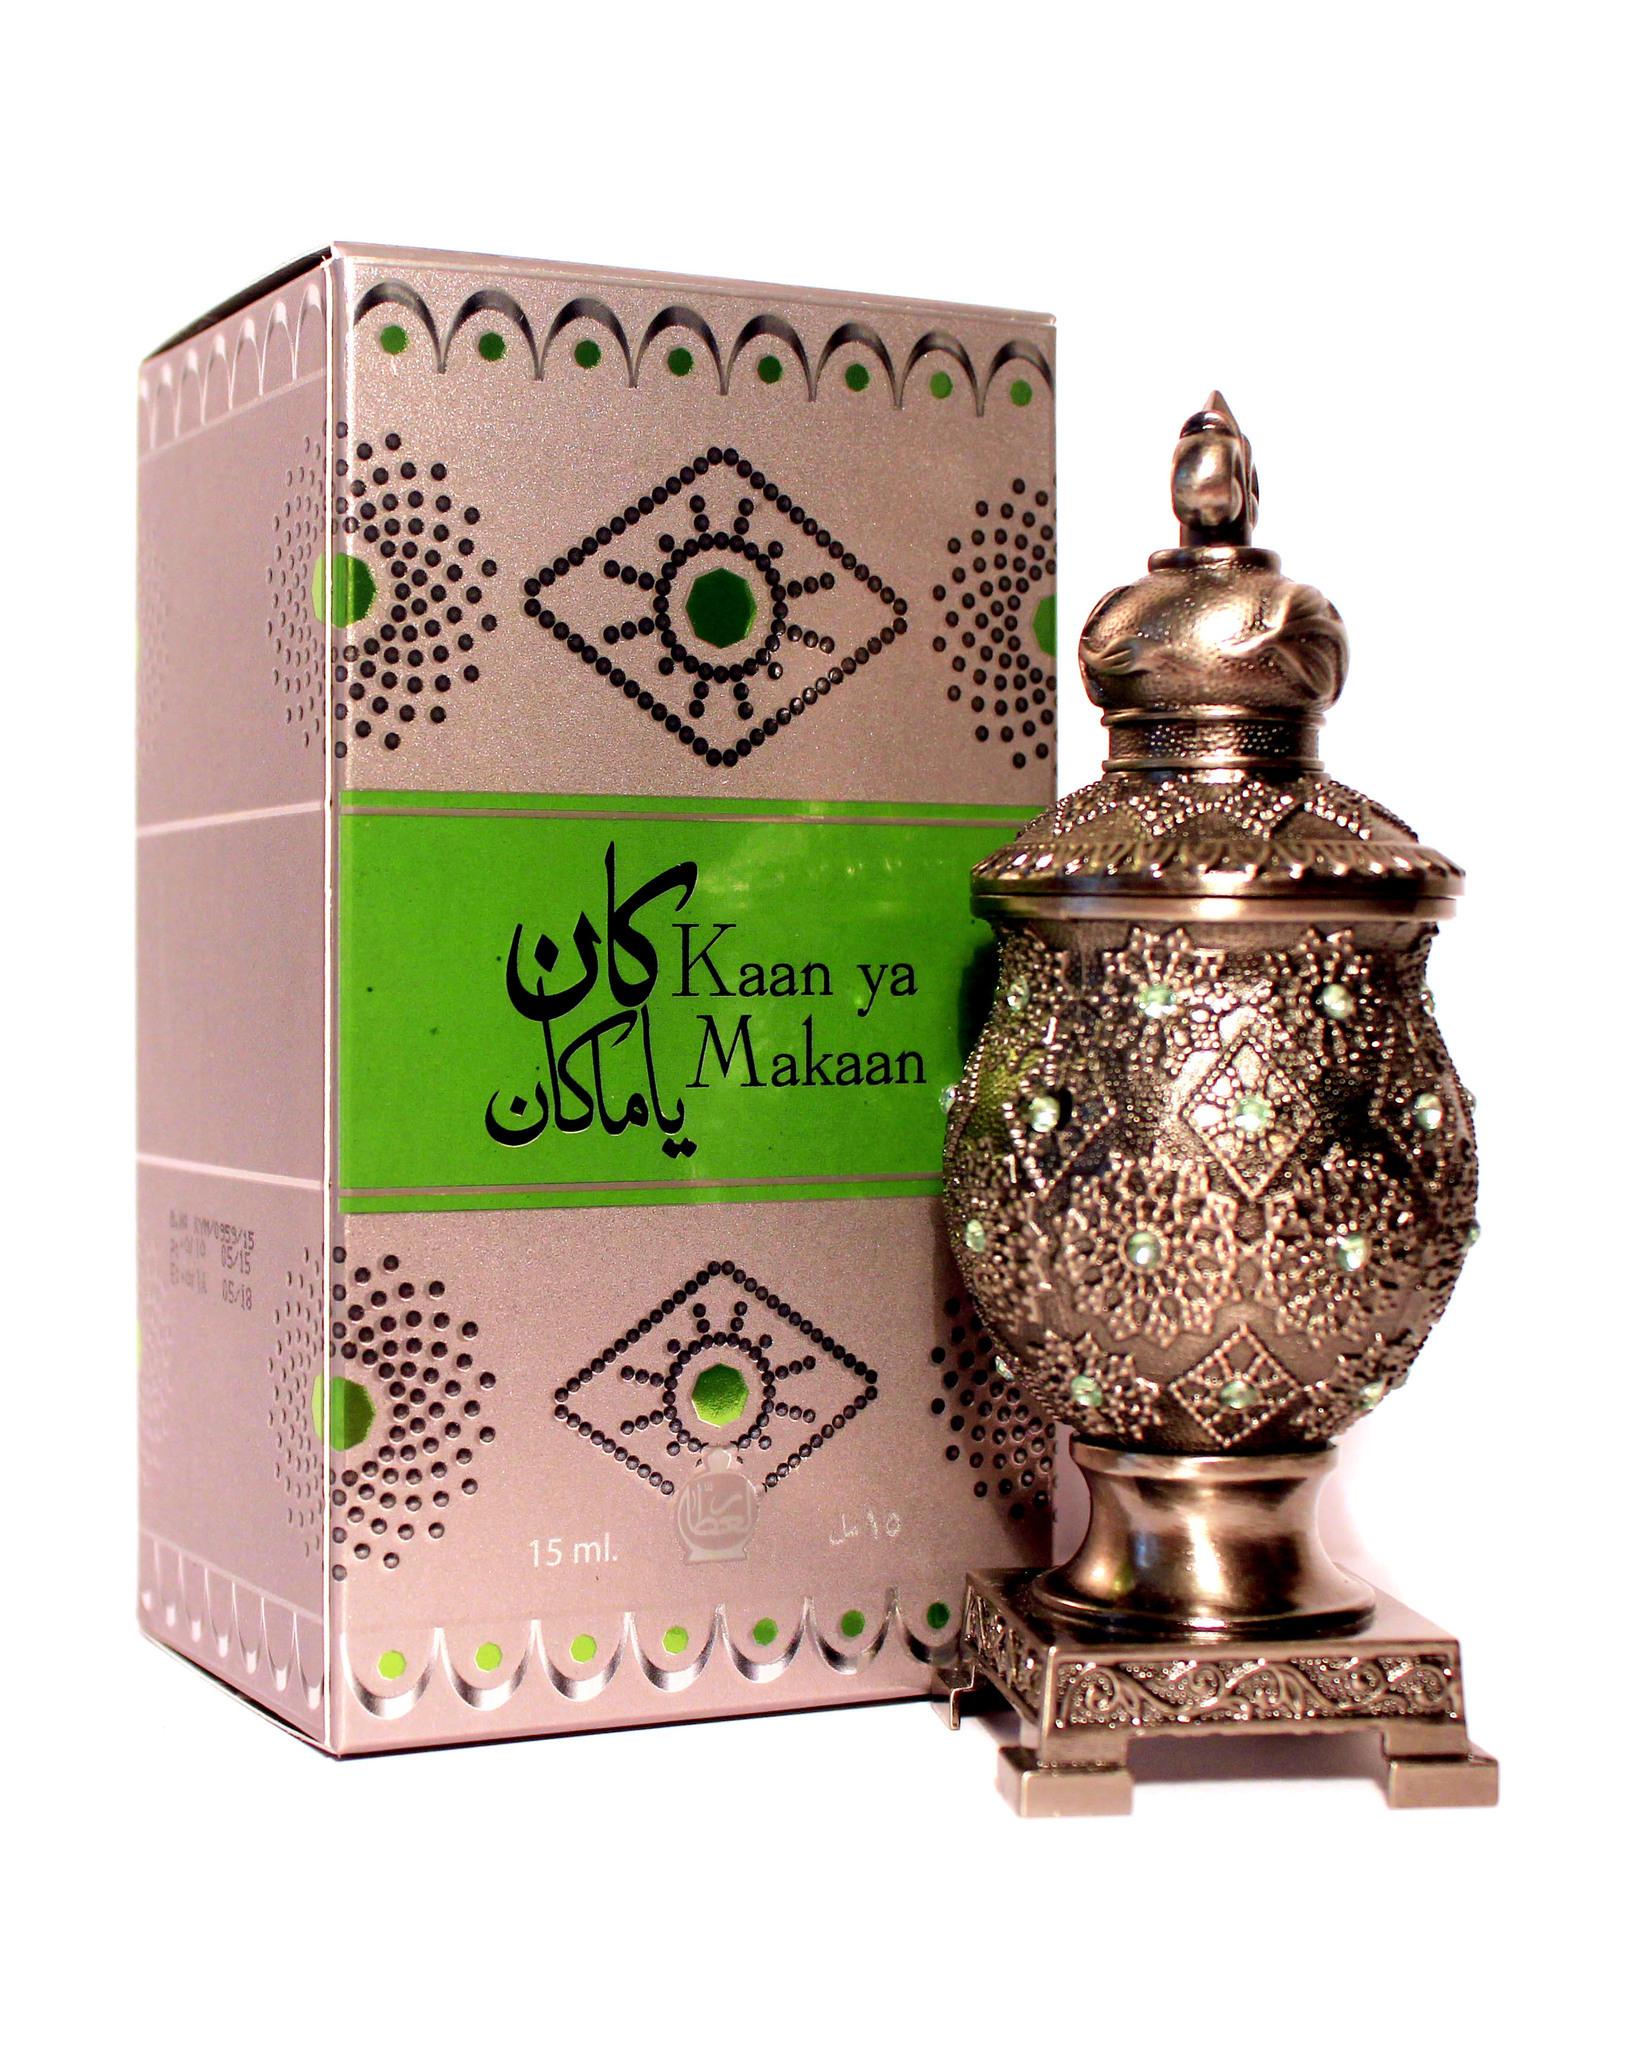 Пробник для Kaan Ya Makaan Каан я Макаан 1 мл арабские масляные духи от Афнан Парфюм Afnan Perfumes